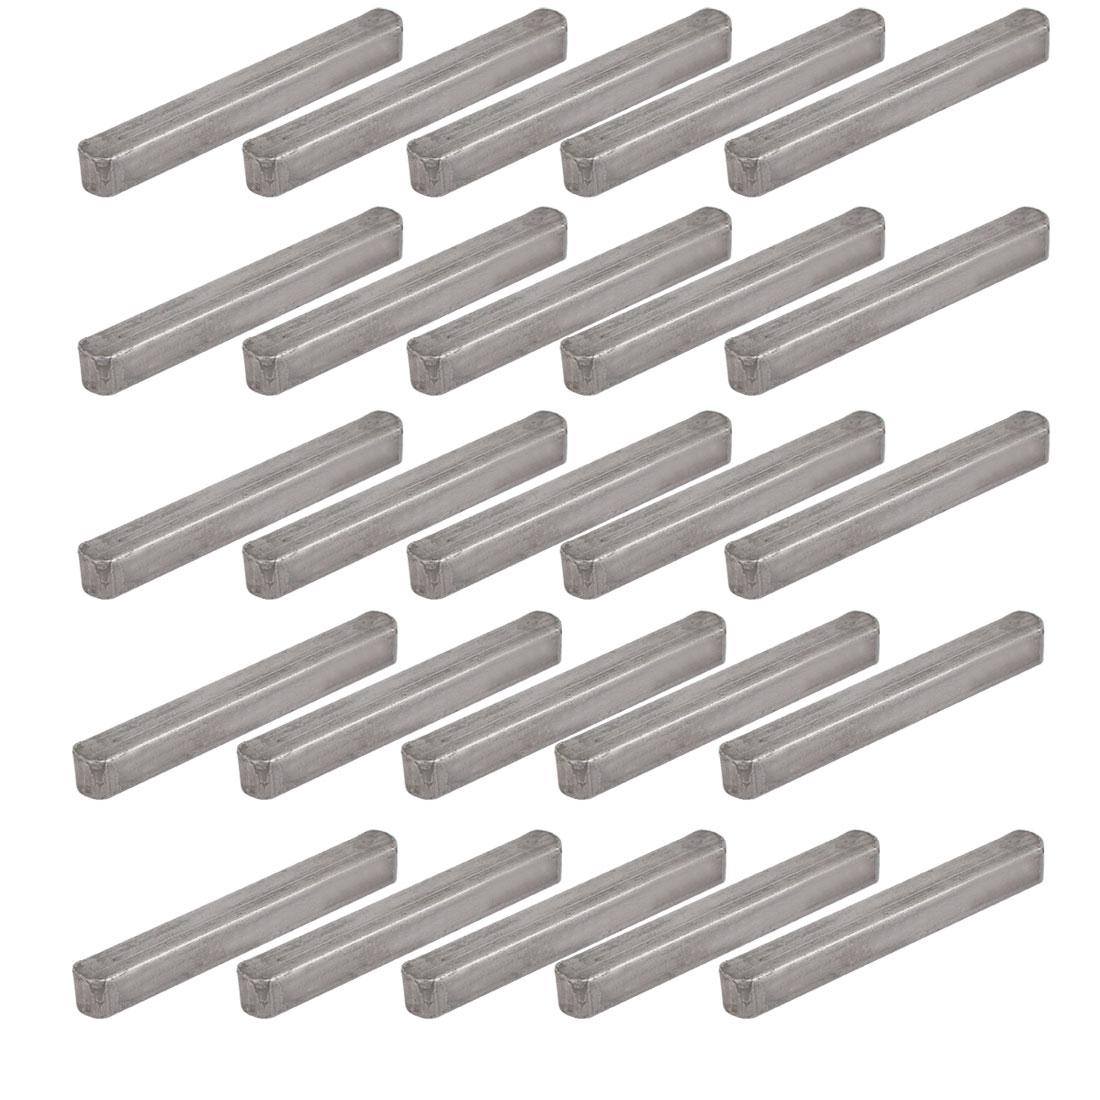 50mmx6mmx6mm Carbon Steel Key Stock To Lock Pulleys 25pcs